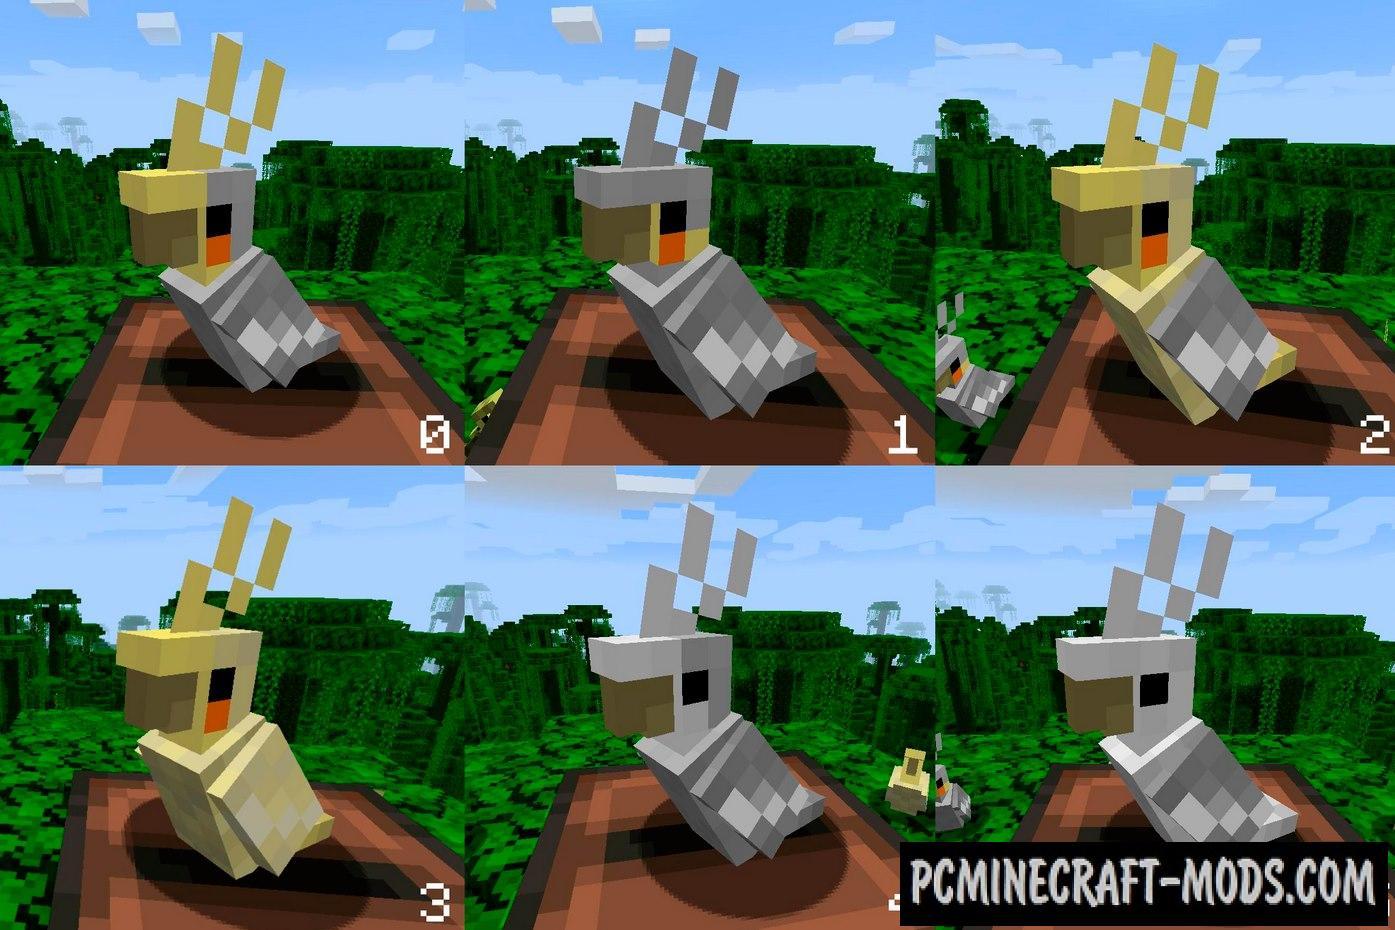 The Parakeet - Creature Tweak Mod Minecraft 1.16.5, 1.16.4